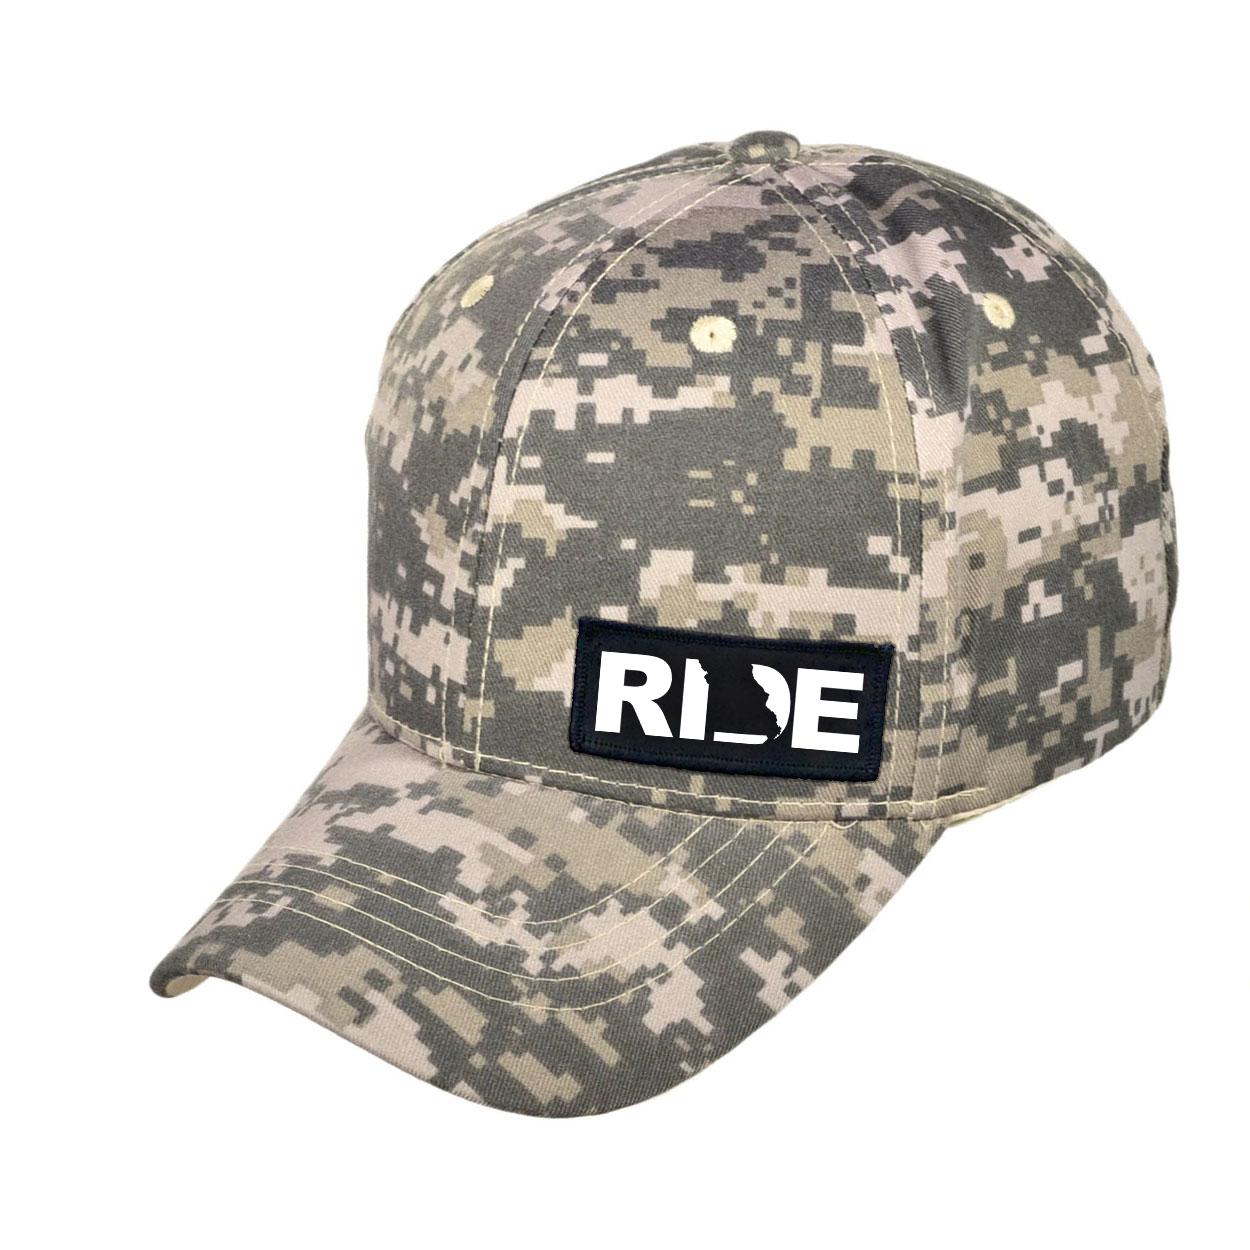 Ride Missouri Night Out Woven Patch Hat Digital Camo (White Logo)